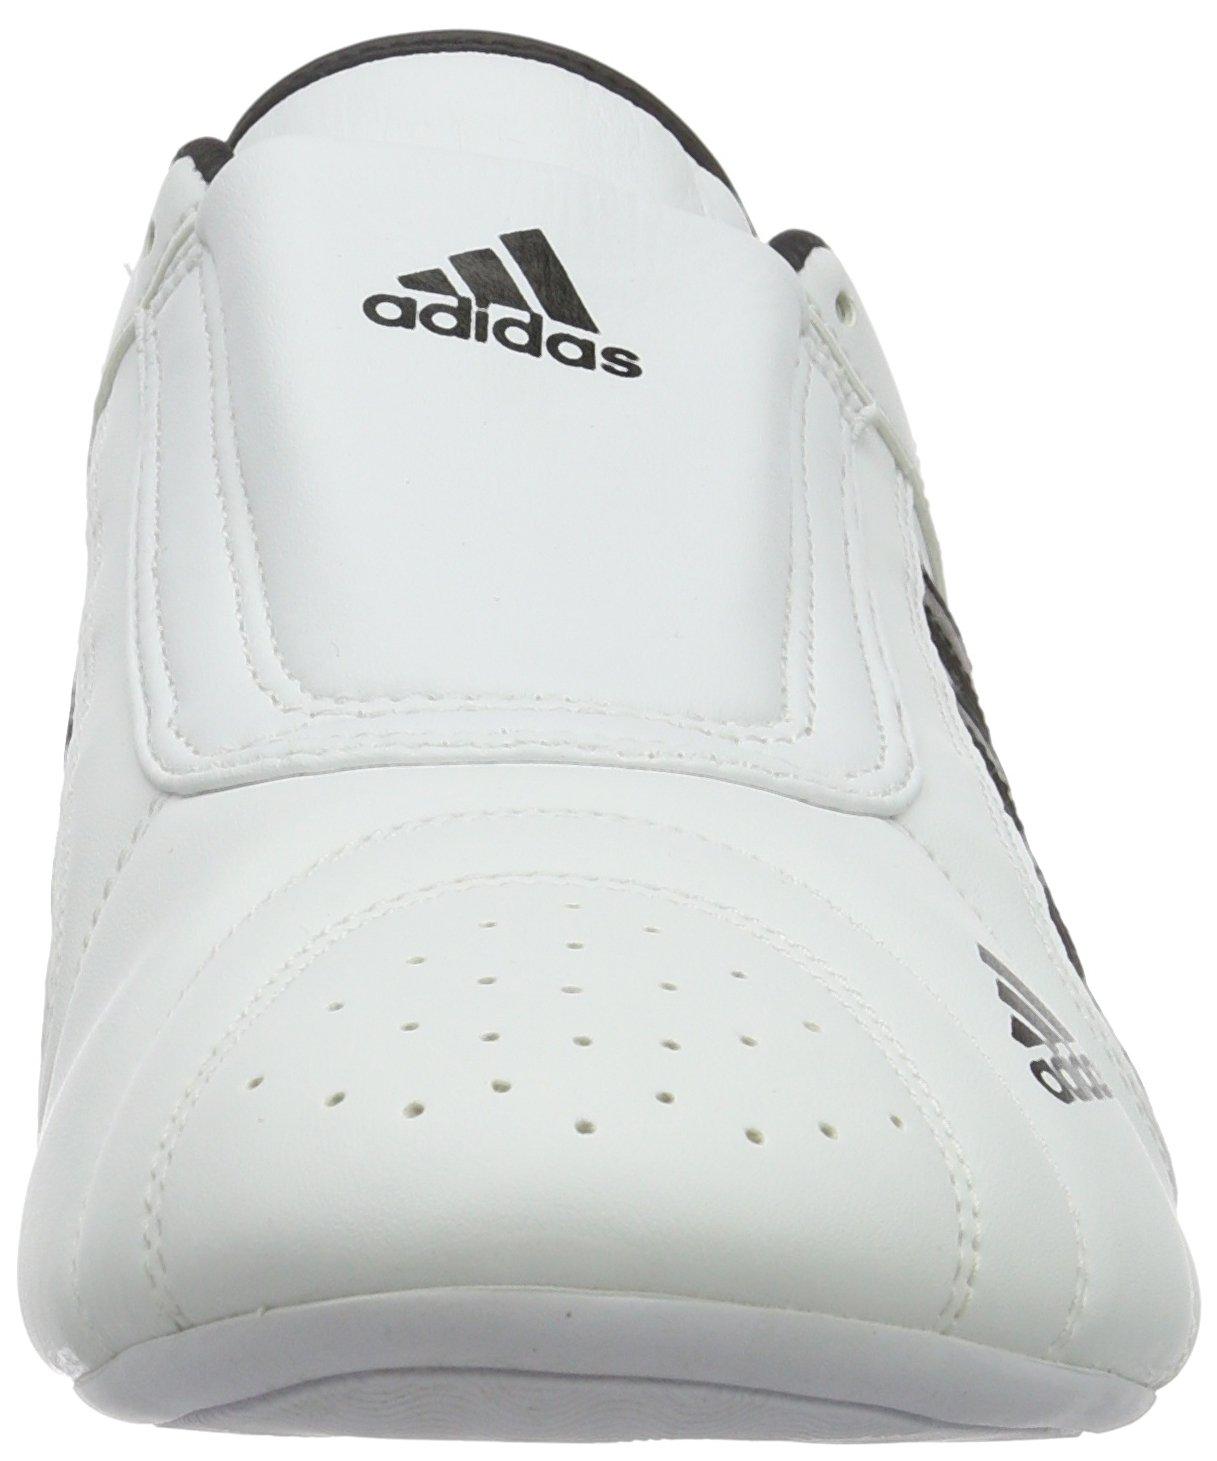 Loisirs Adidas Sm Et Chaussures IiiWeiss37 13Sports nOX0Z8wkNP